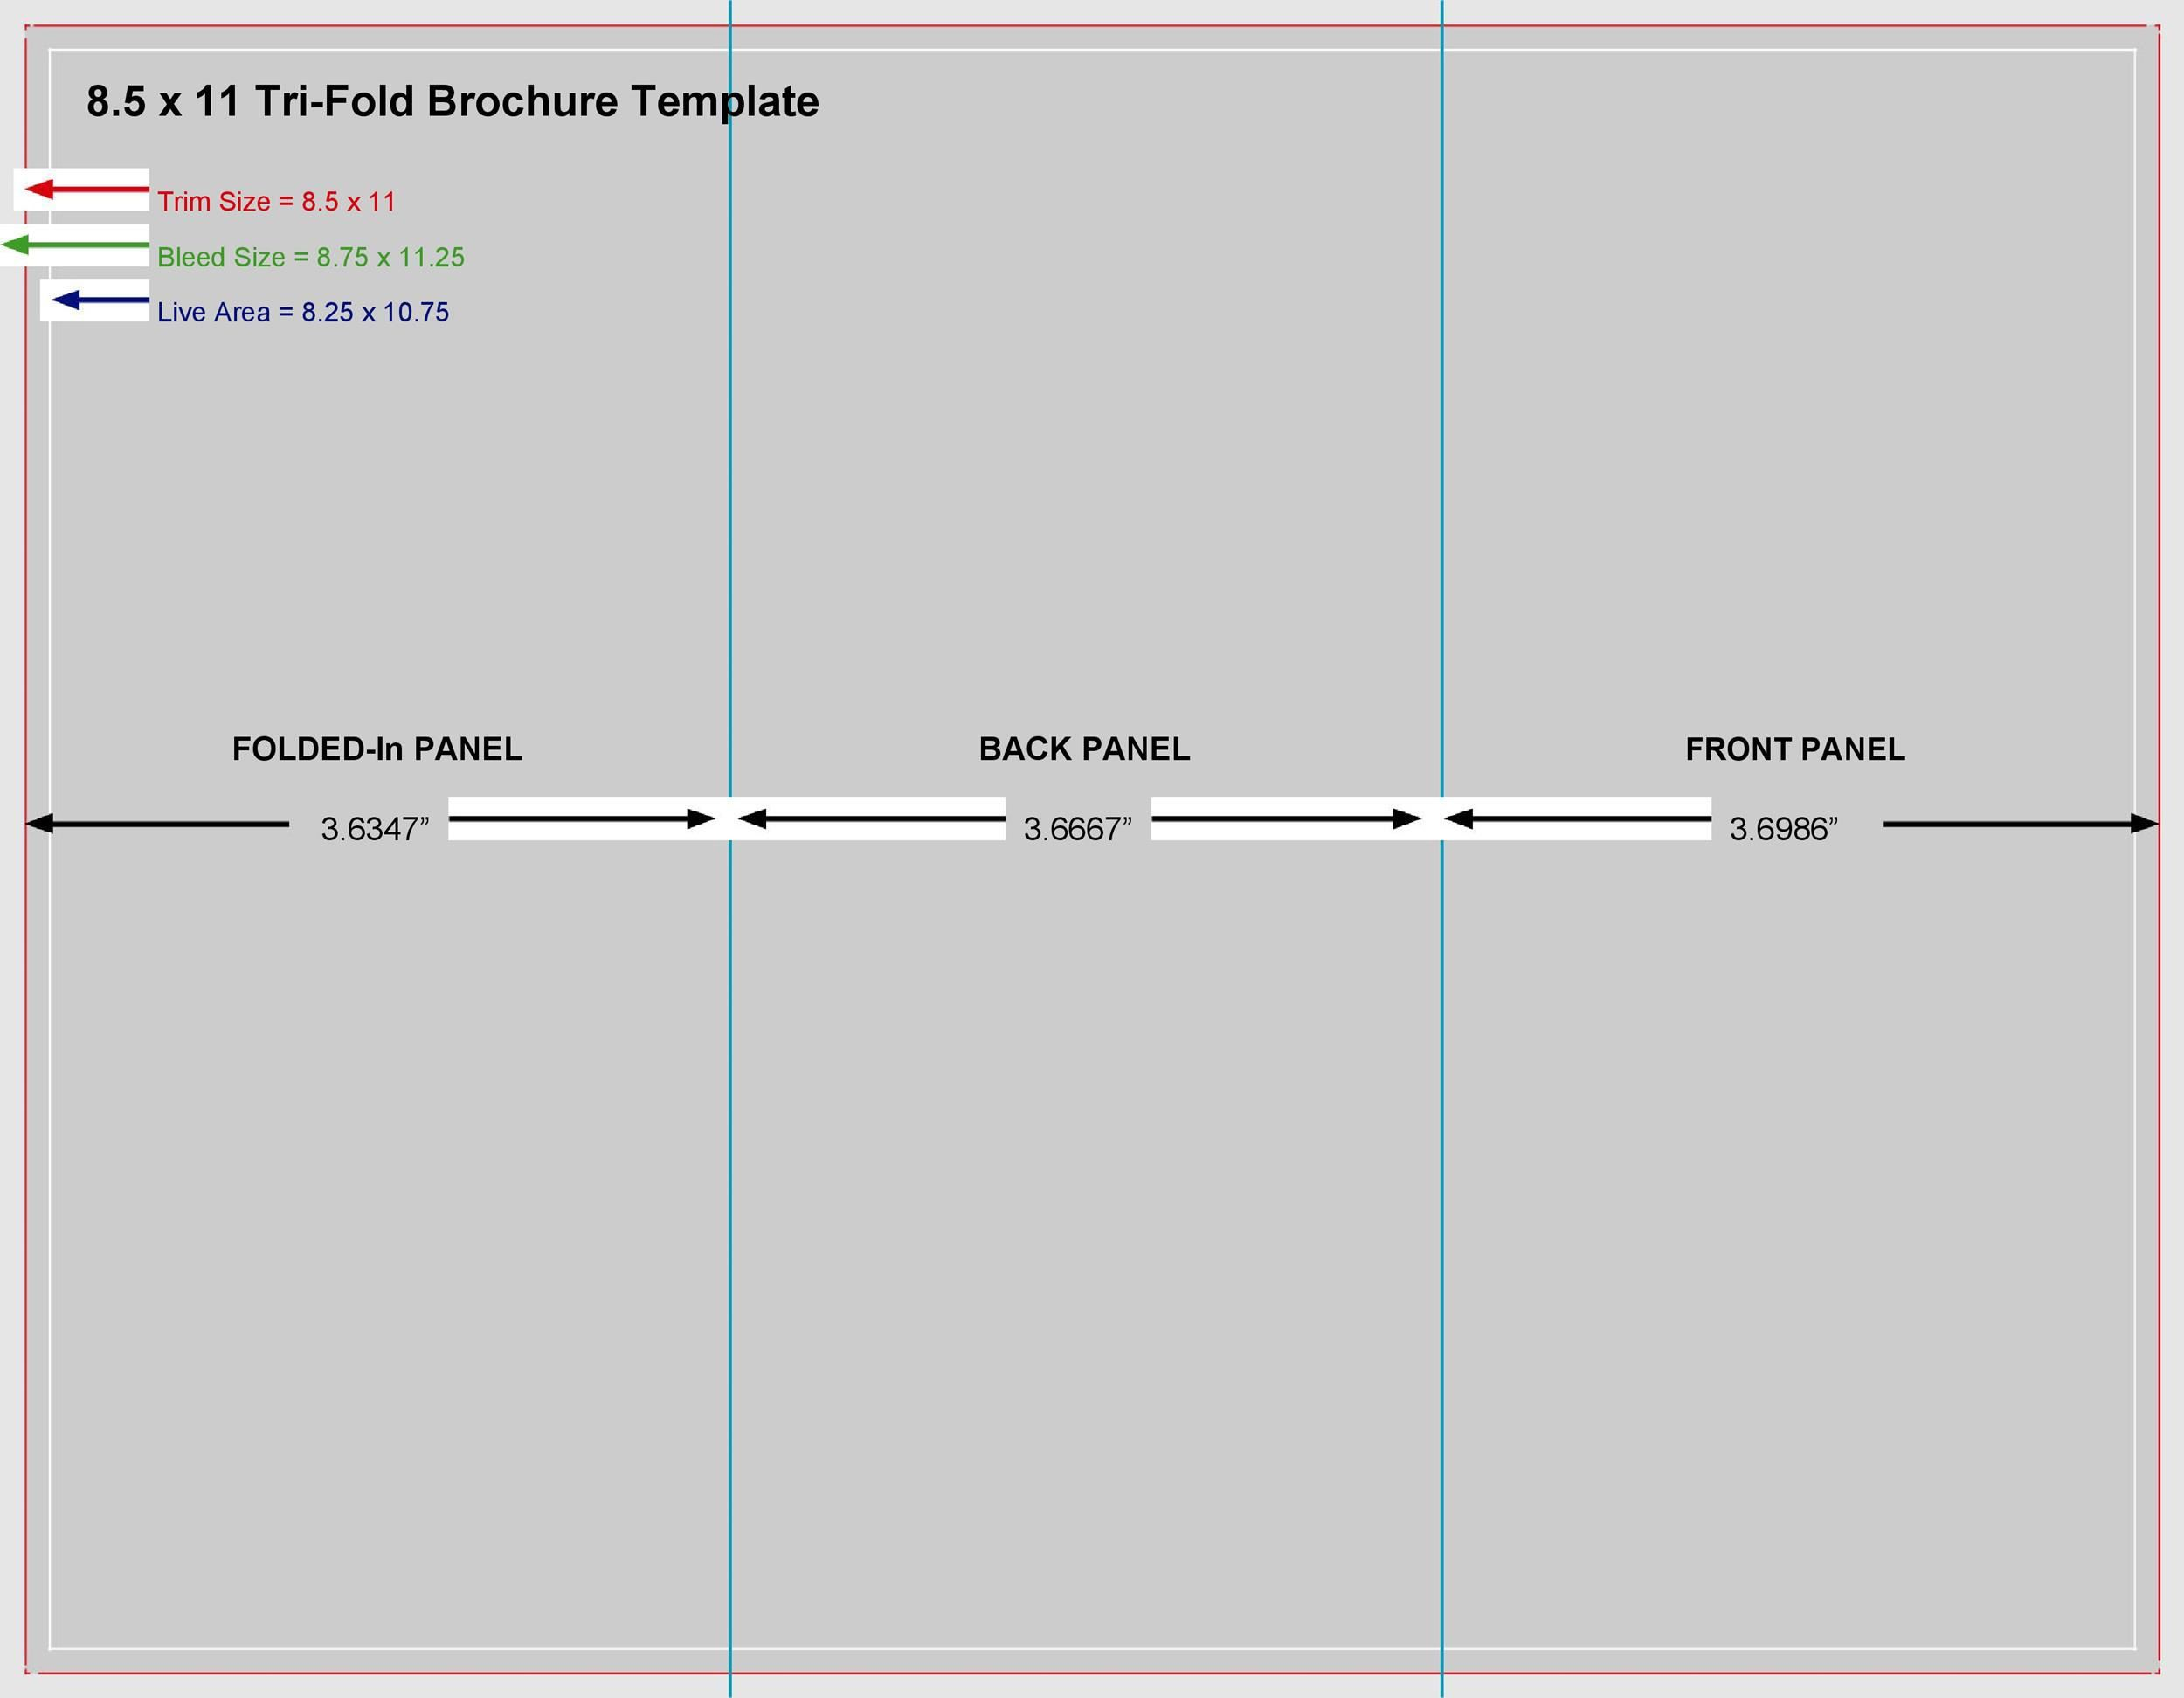 008 Unique Brochure Template For Google Doc High Definition  Docs Free 3 Panel Tri FoldFull